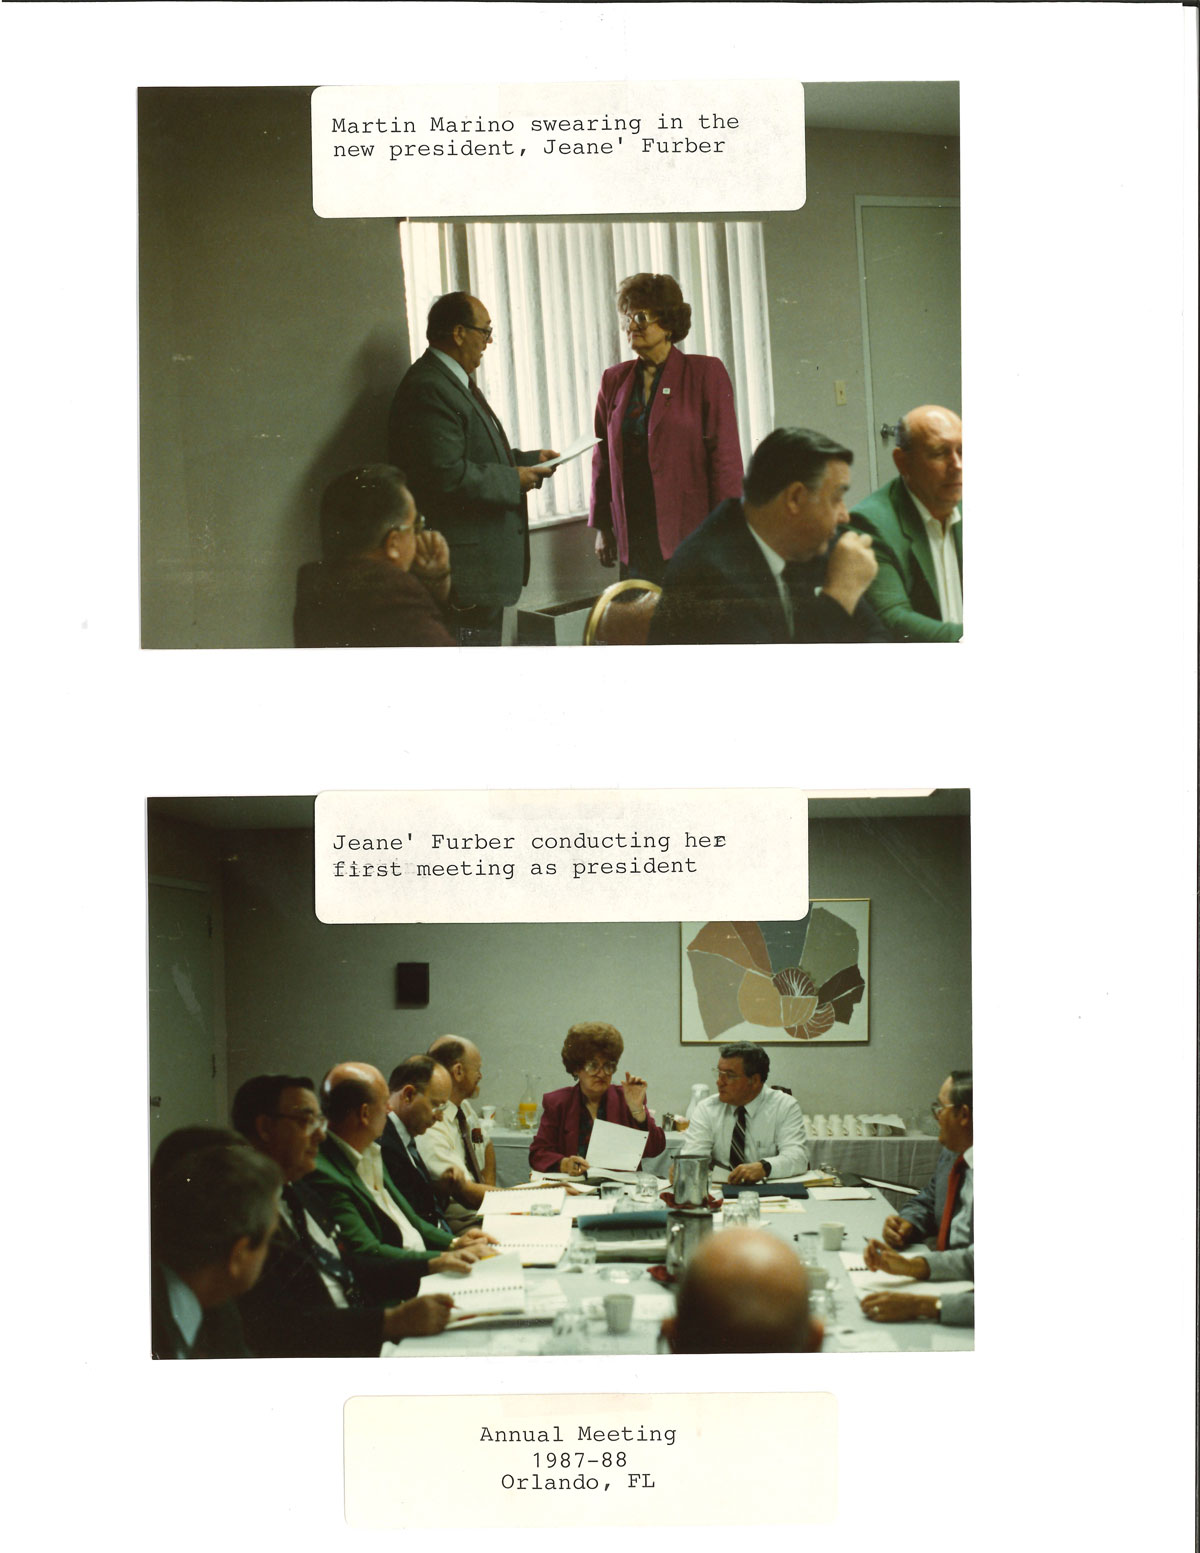 Annual-meeting-1987-1988-Jeane-Furber-